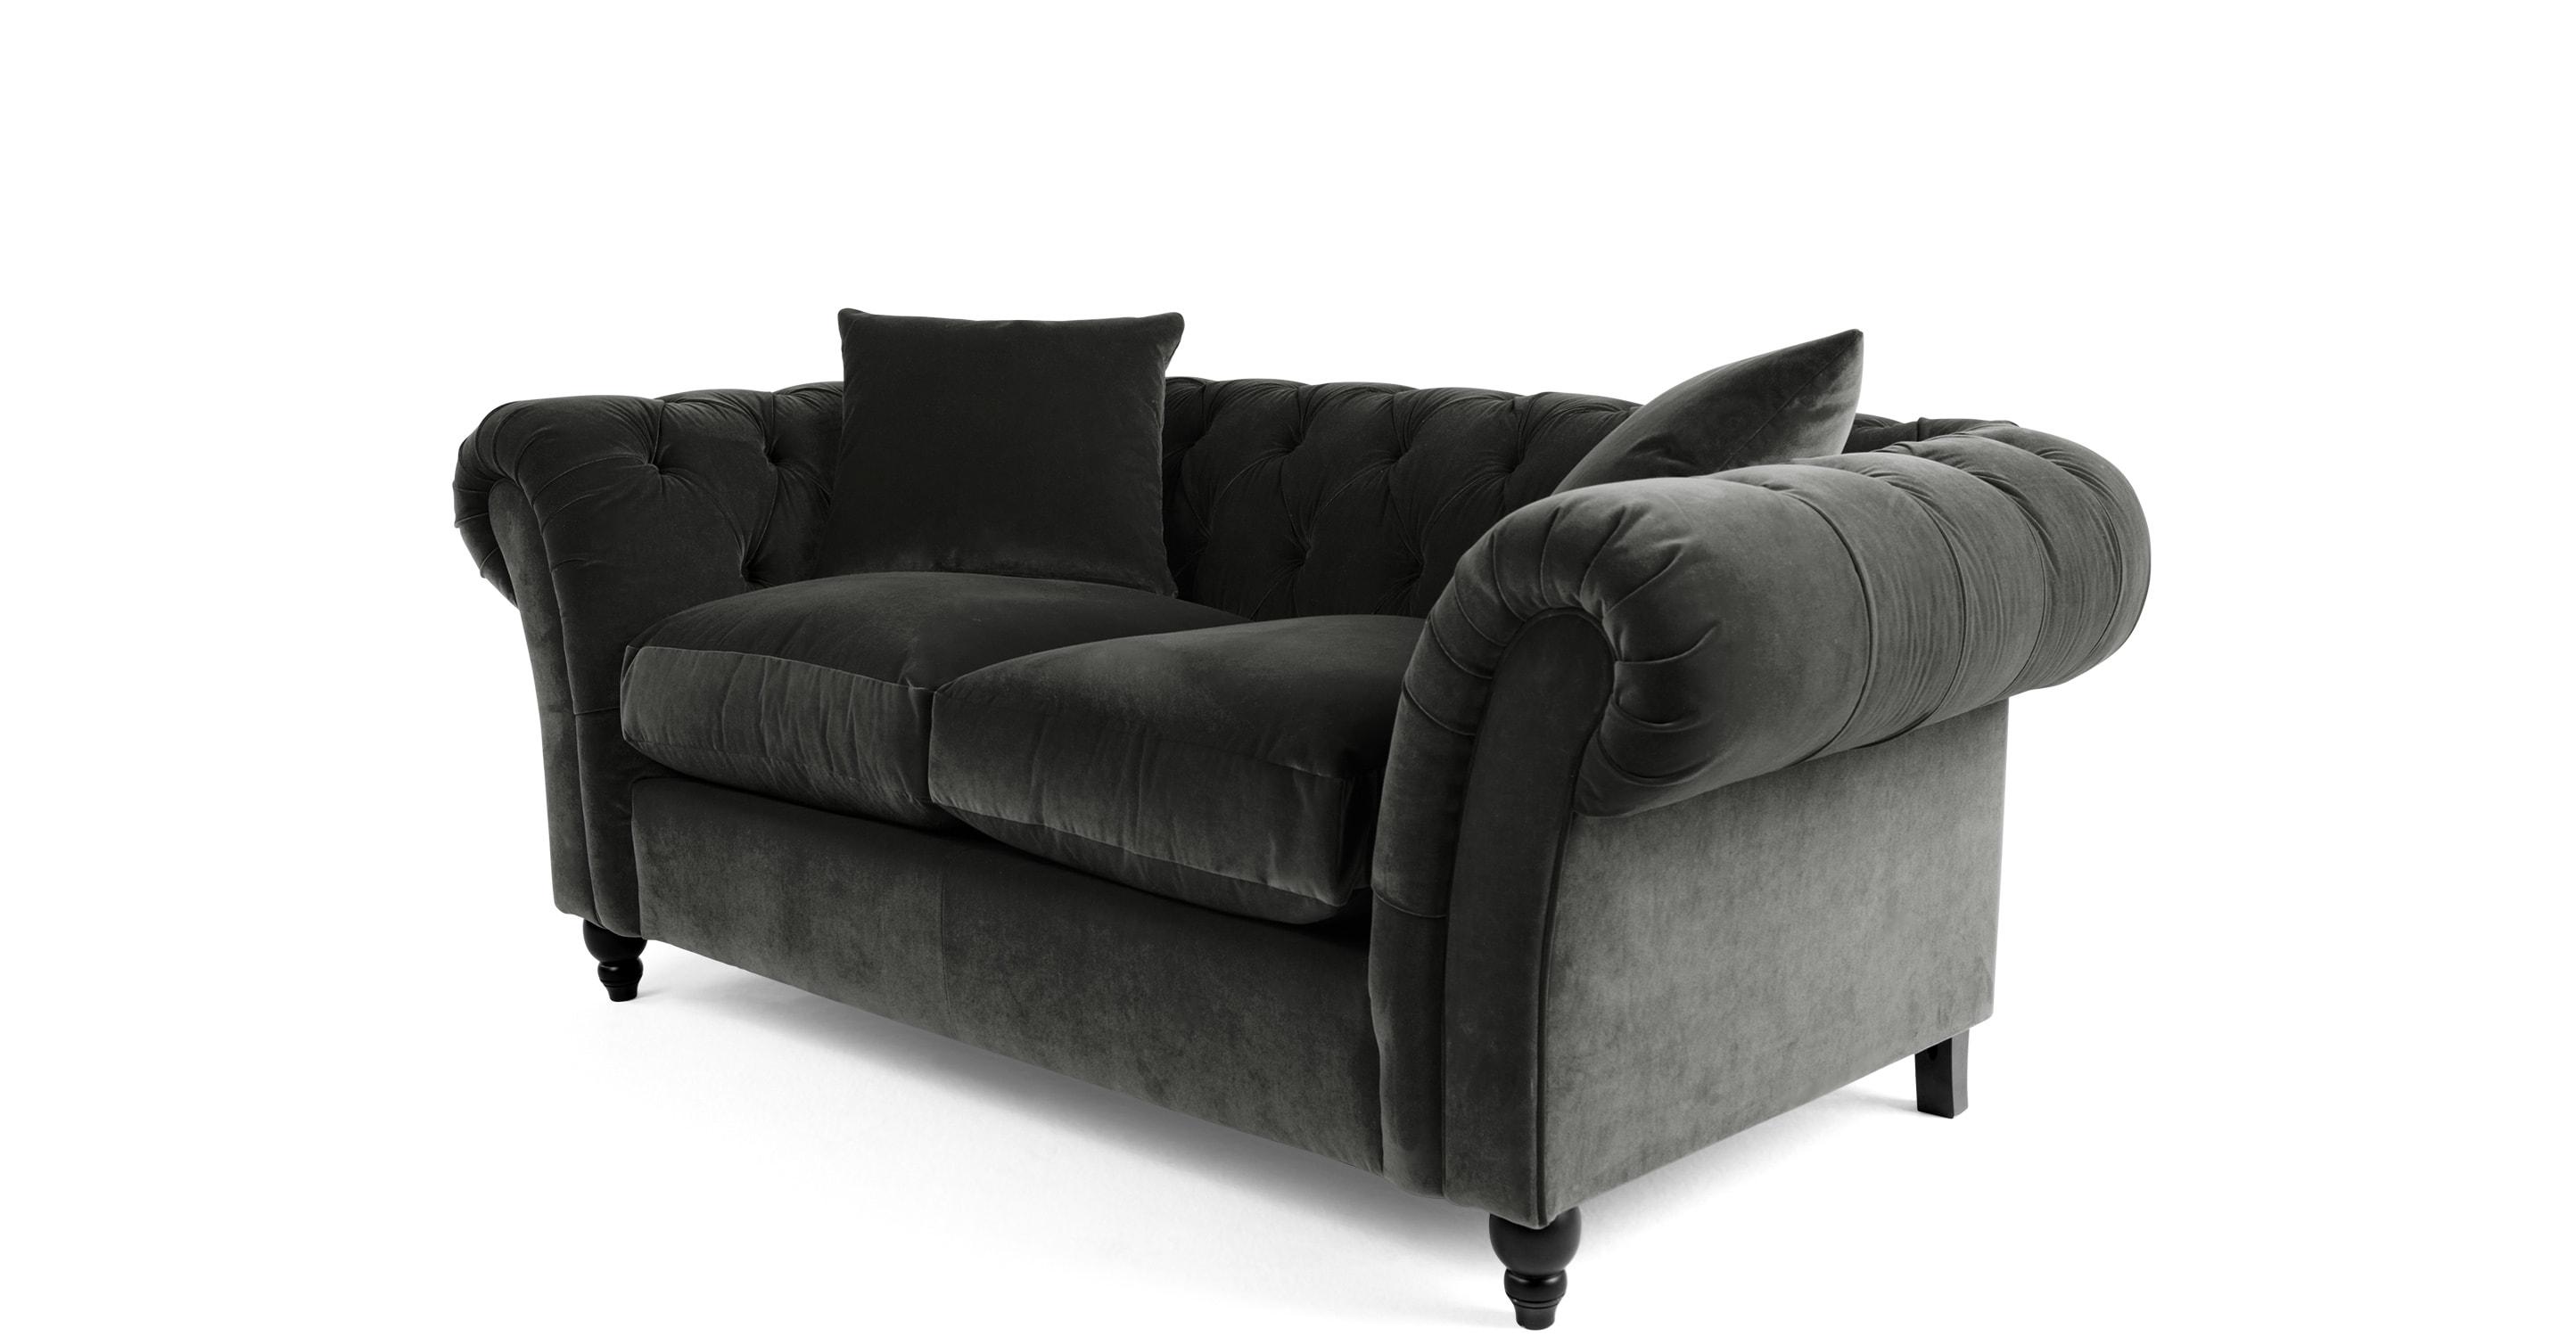 chesterfield sofa bed grey velvet spinning chair bardot 2 seater mink